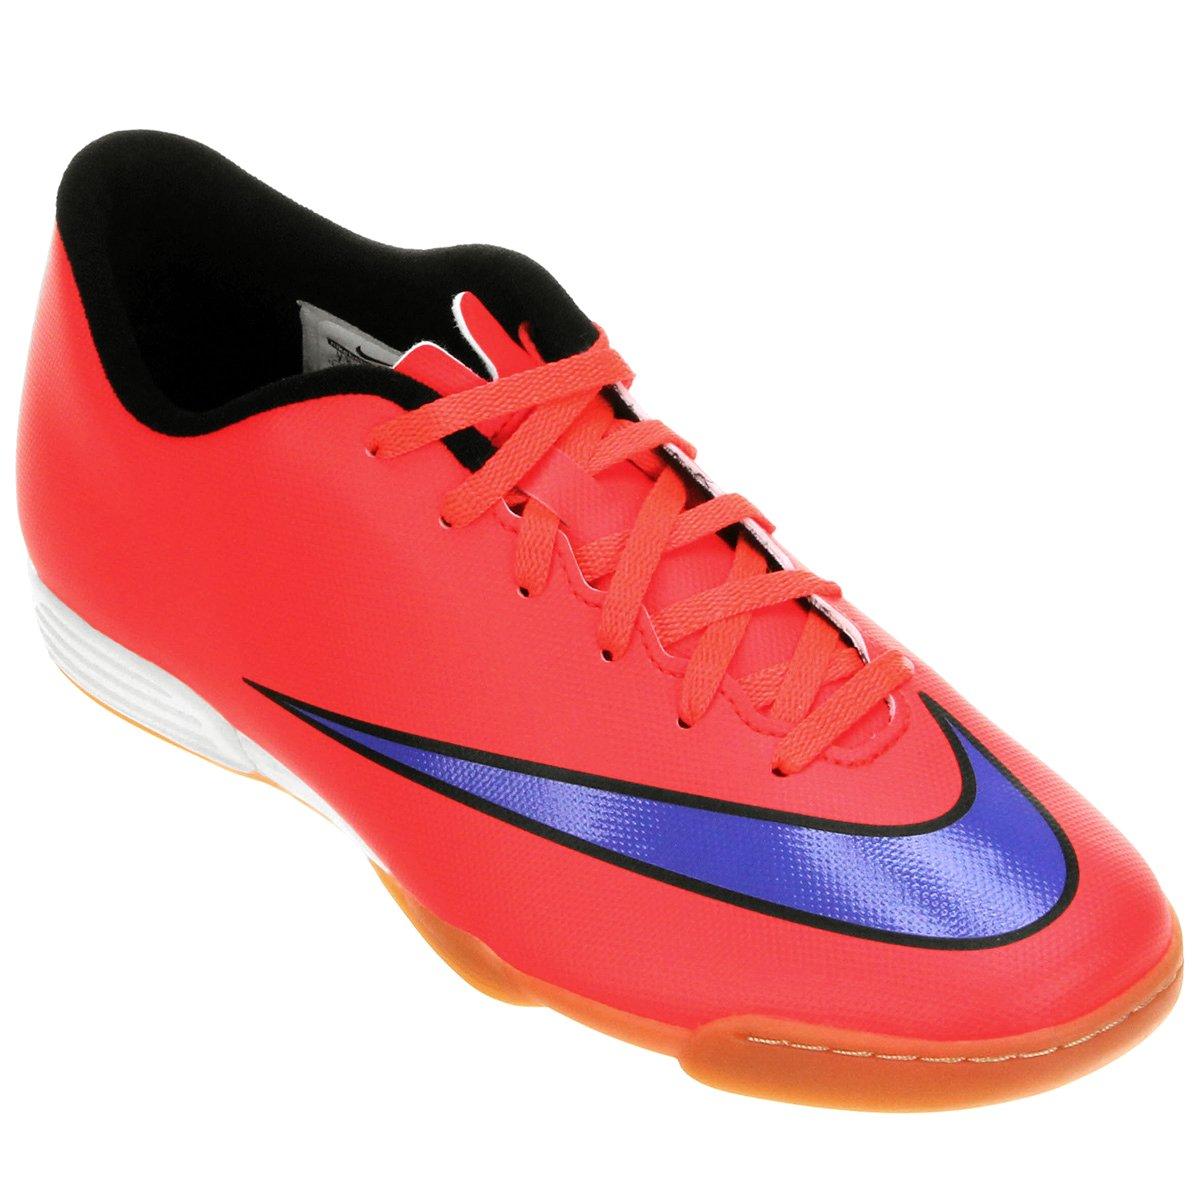 Chuteira Futsal Nike Mercurial Vortex 2 IC - Compre Agora  b703b269ef544